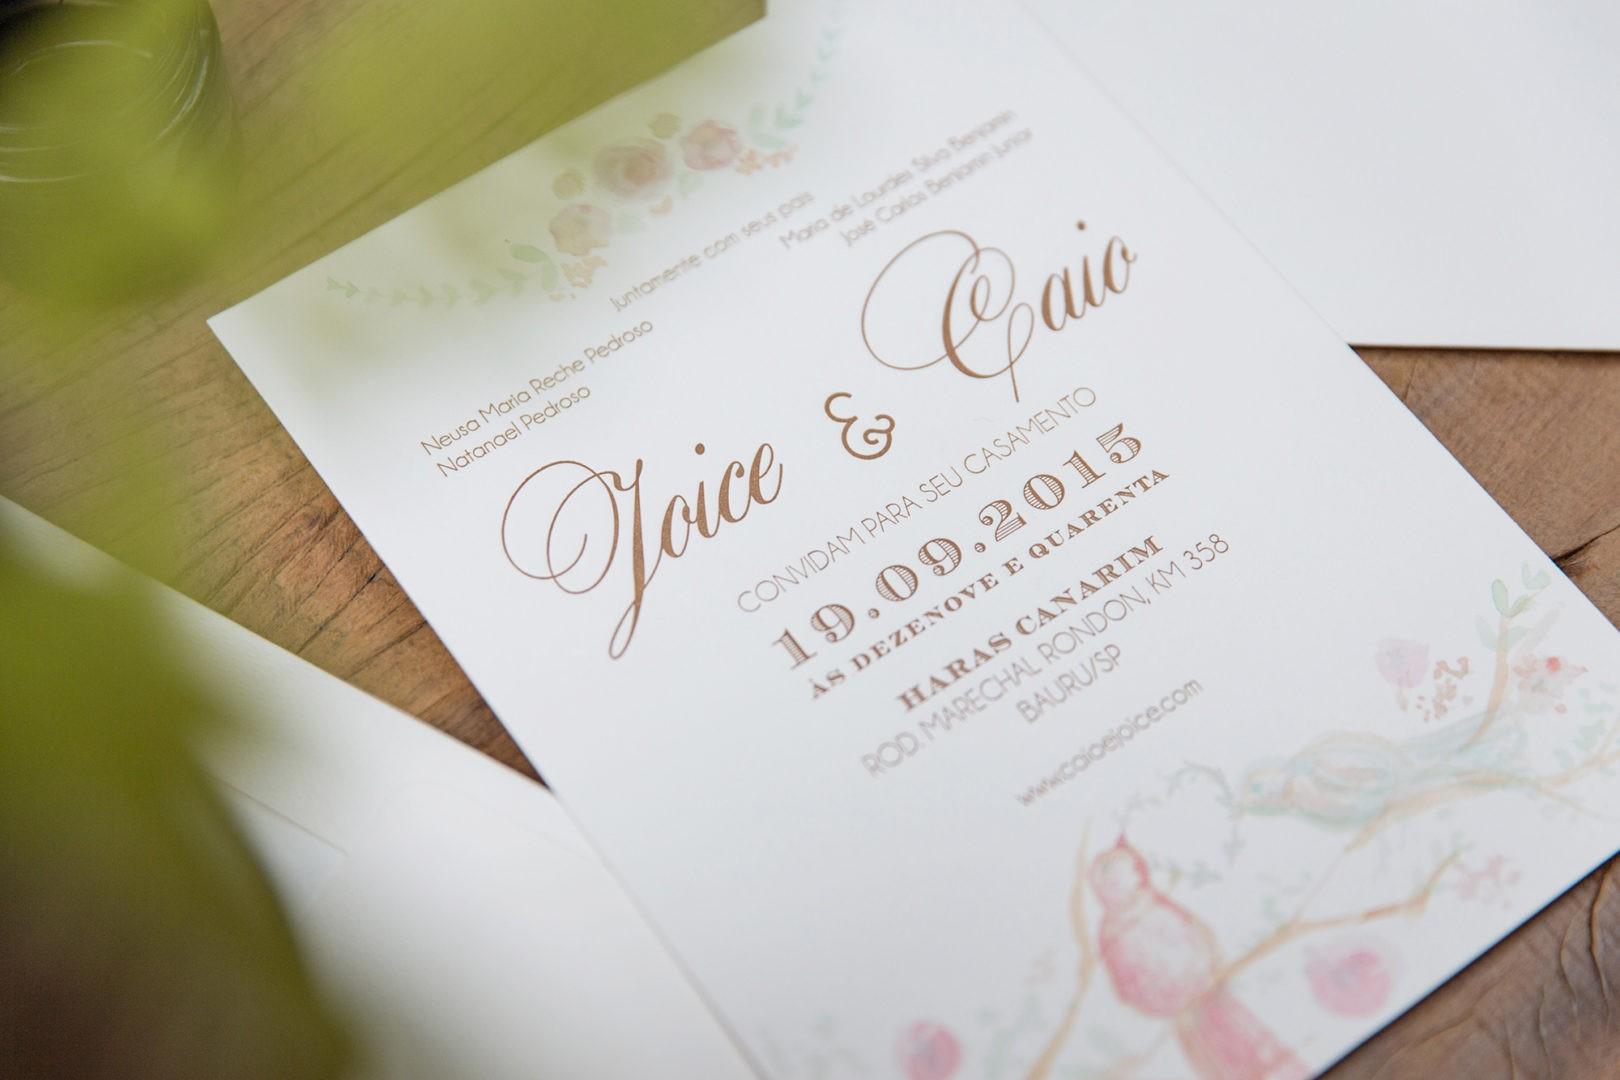 Convite simples com caligrafia colorida da QStampa.